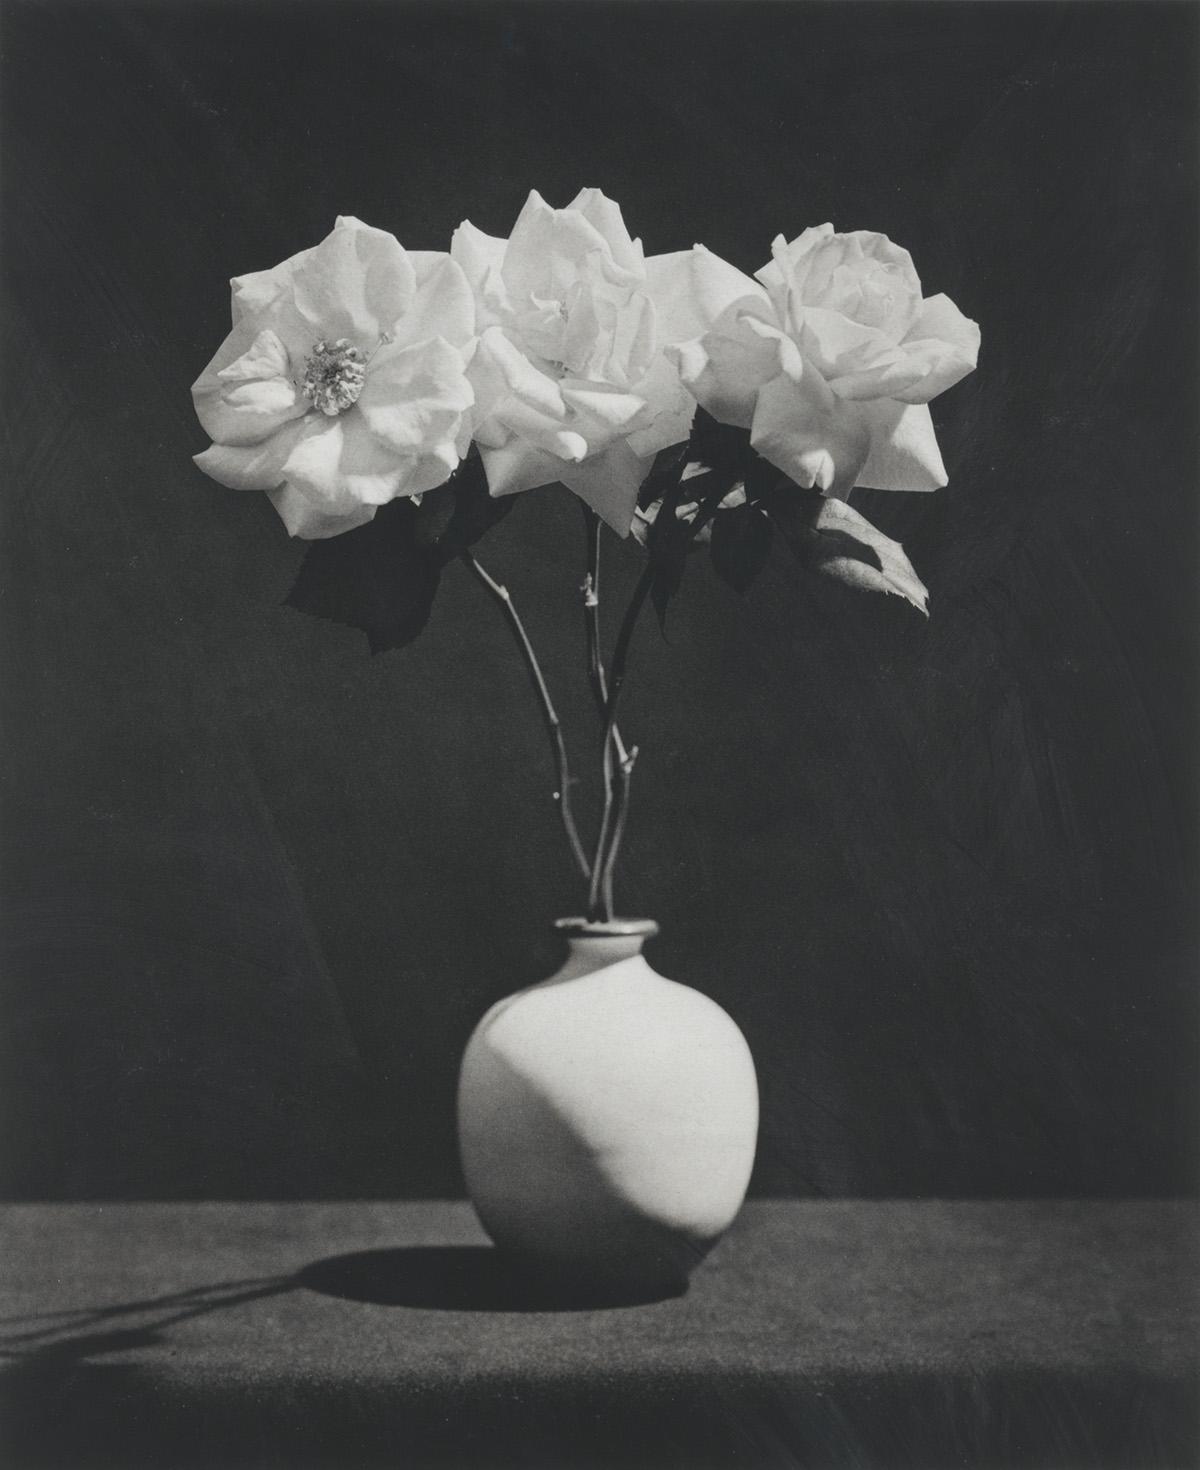 ROBERT MAPPLETHORPE (1946-1989) Three roses in a vase.